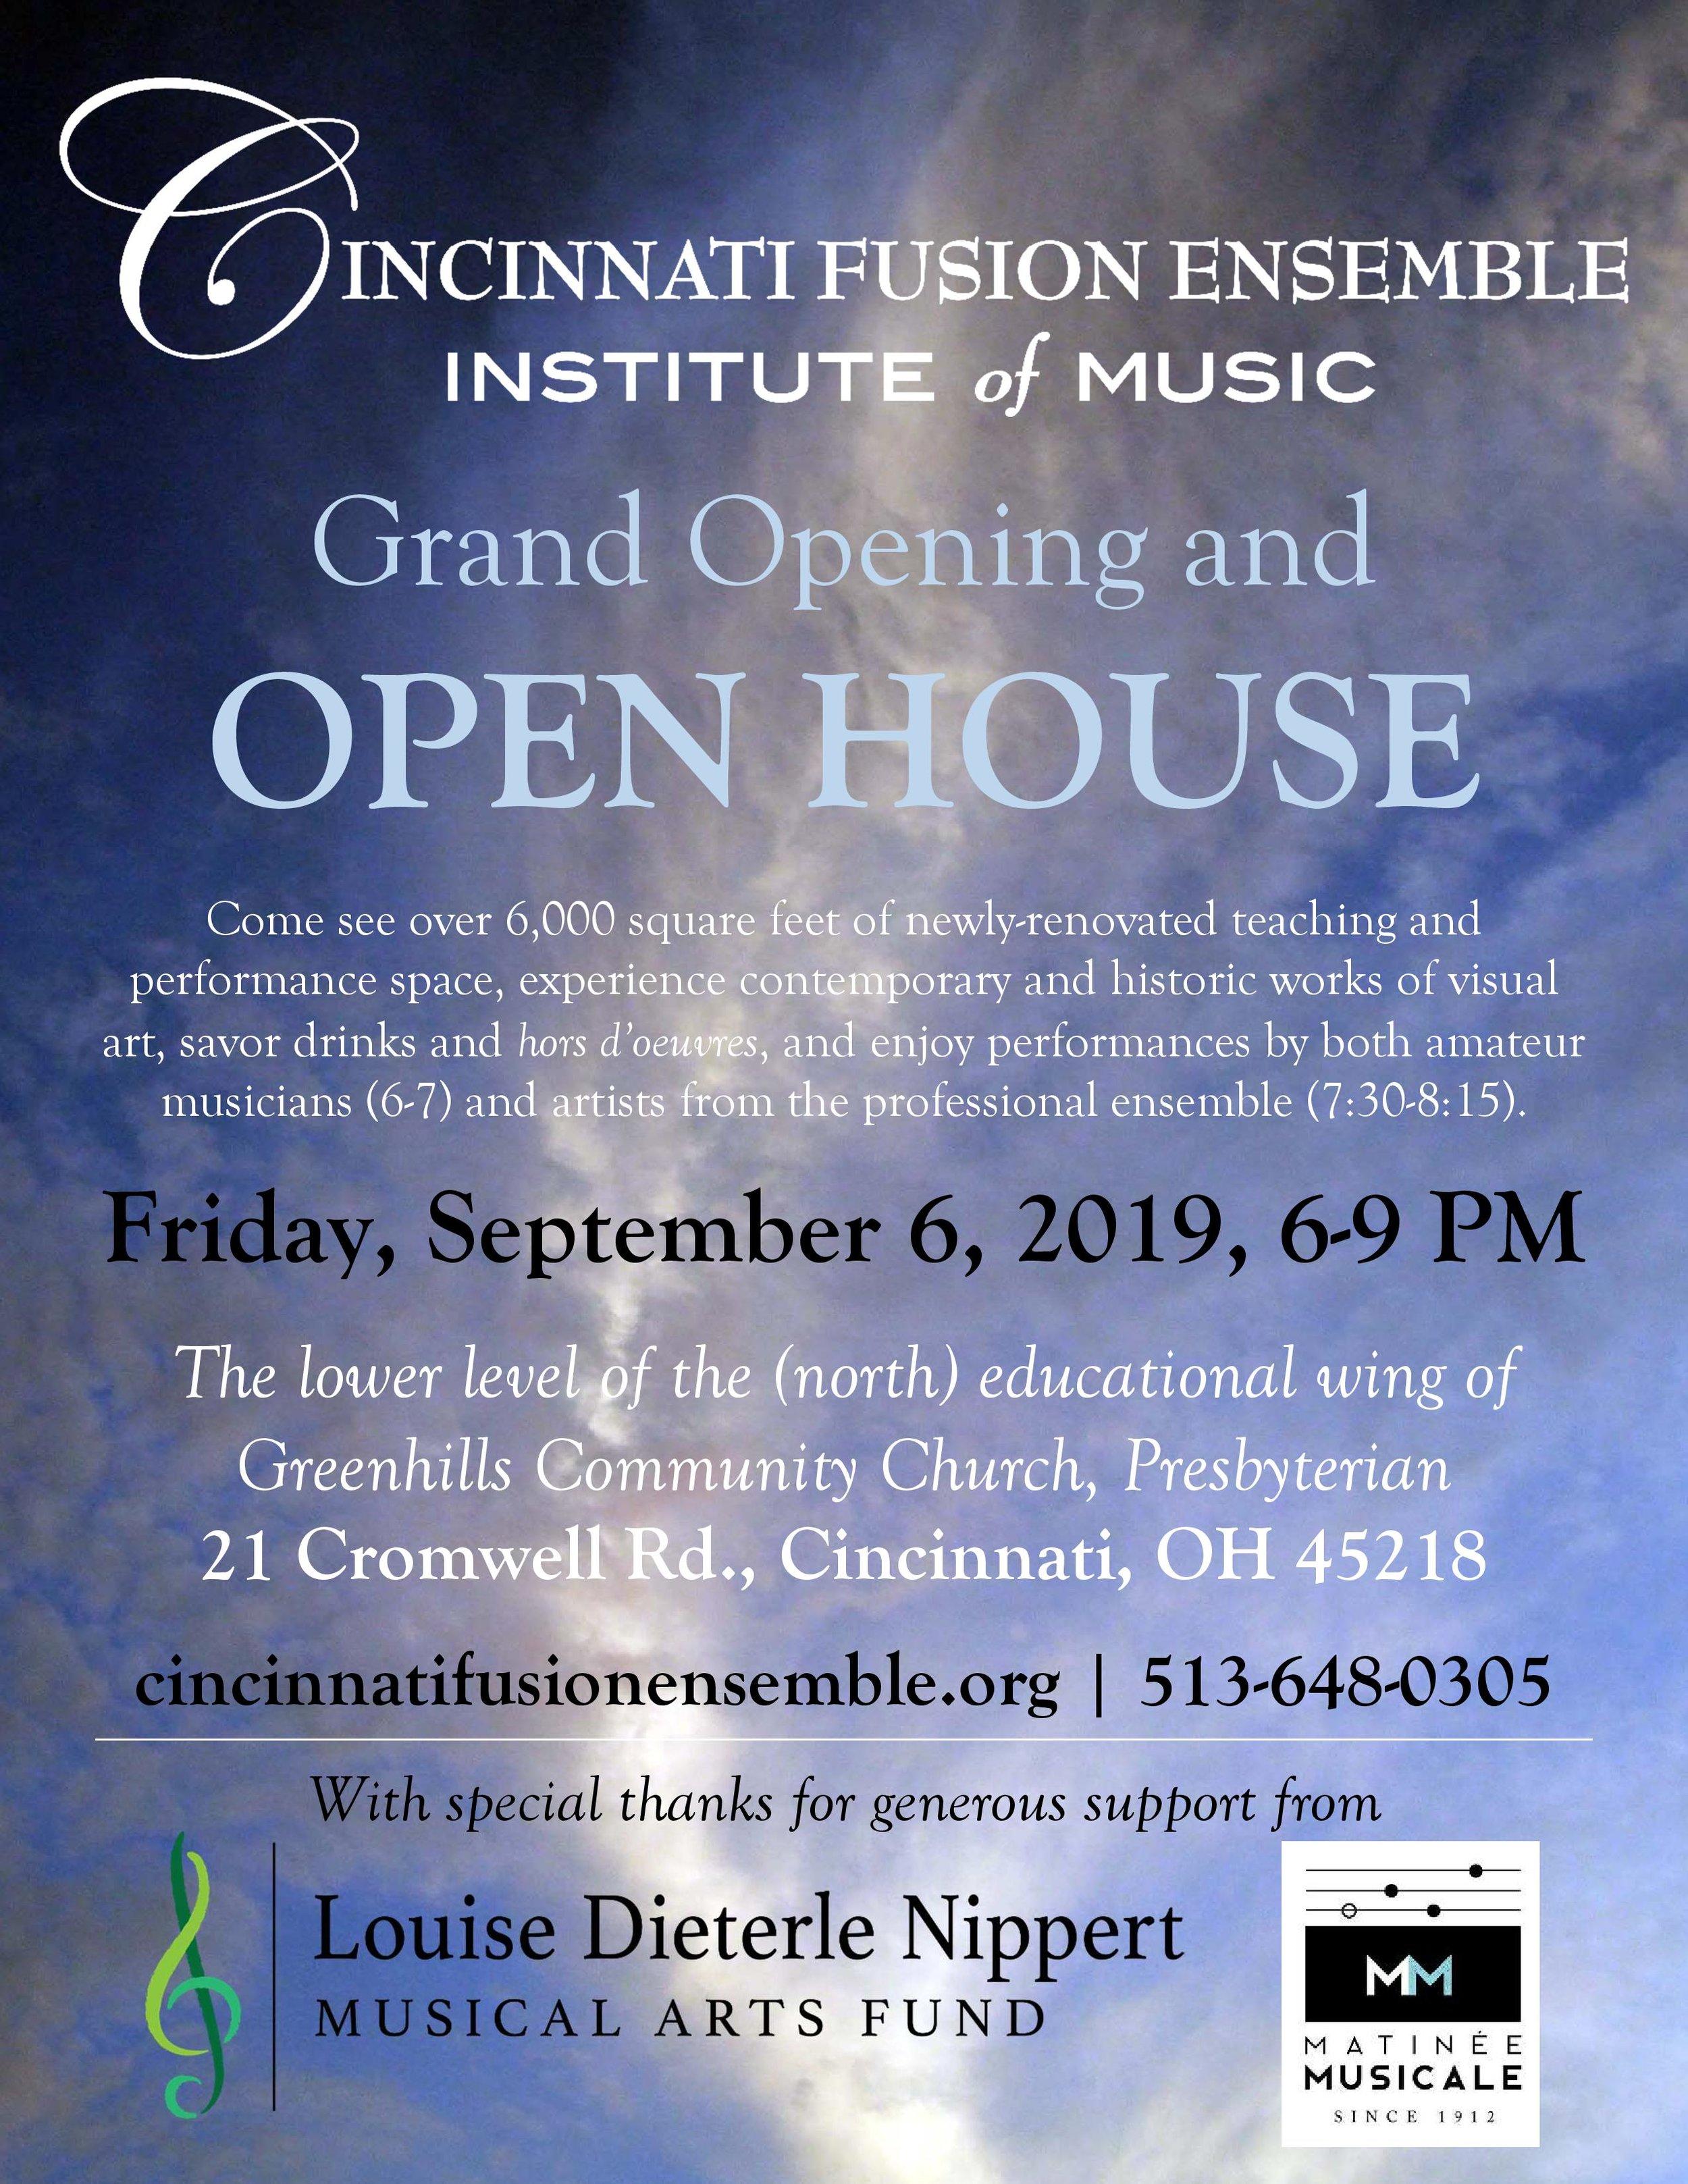 CFE Institute of Music, open house flyer, 9-6-19.jpg